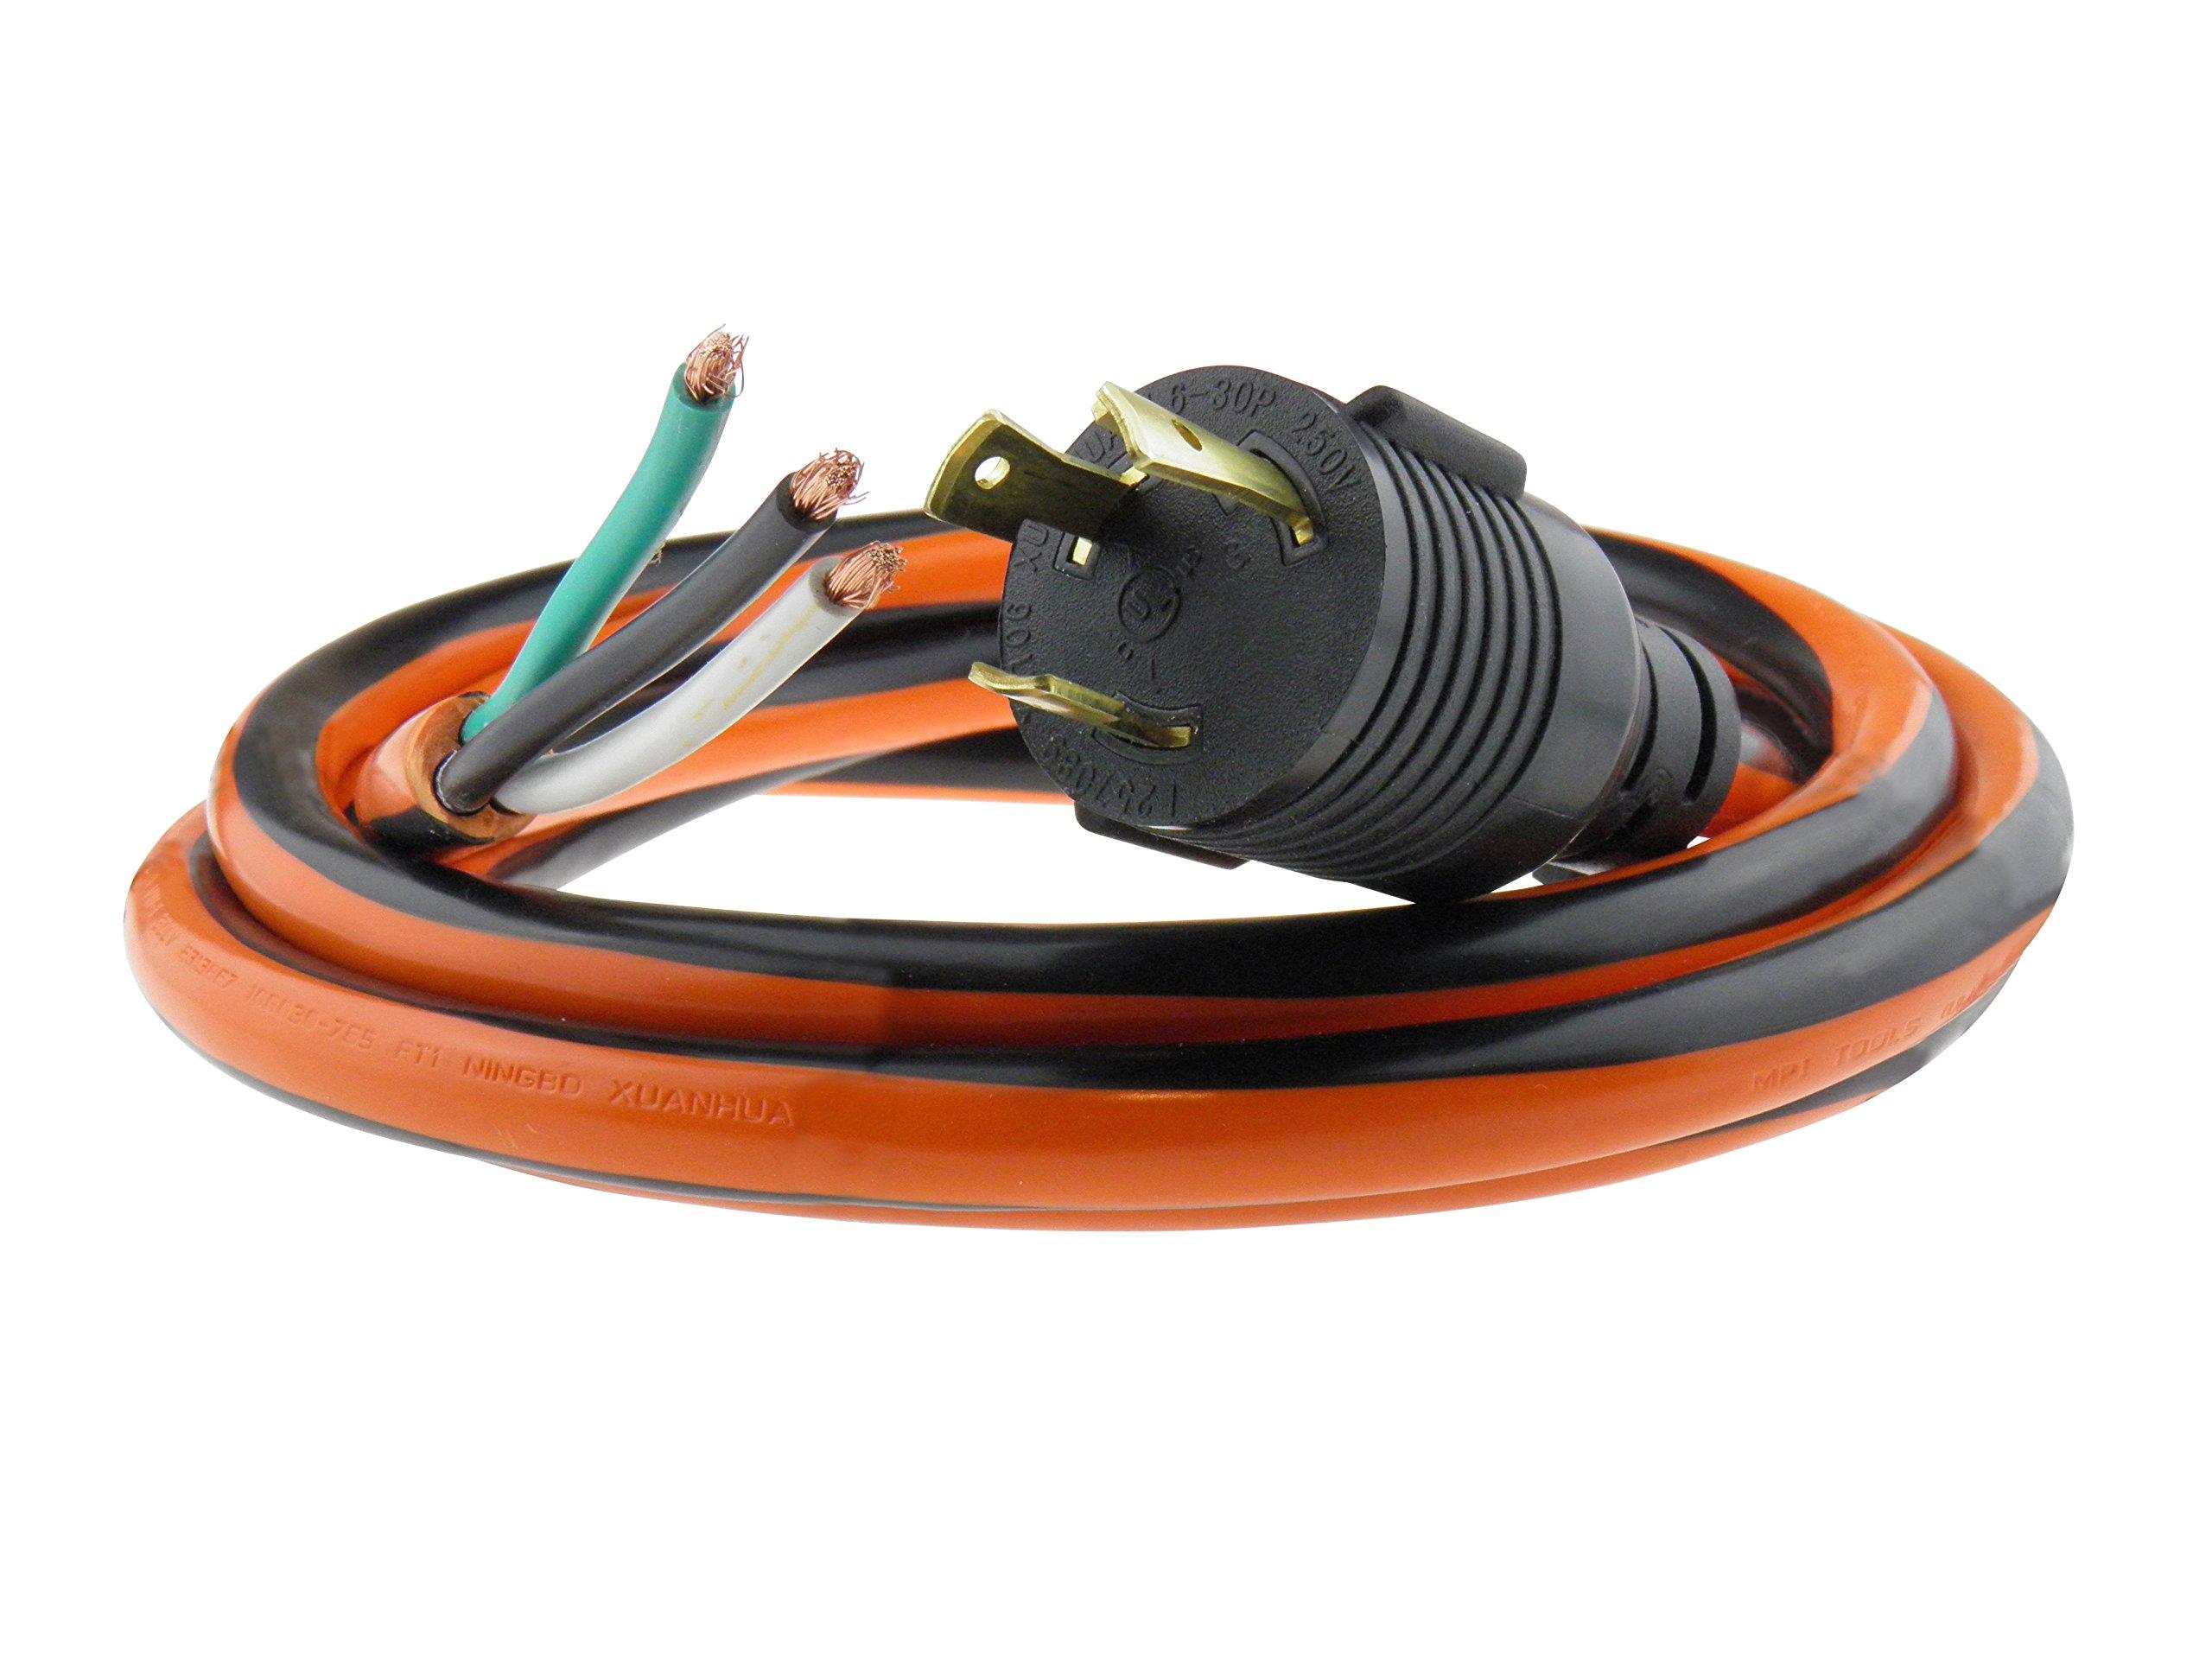 MPI Tools Nema L6-30P Generator Power Cord Whip 3 Wire 10 Gauge 125/250v 30 Amp 10 Foot Length